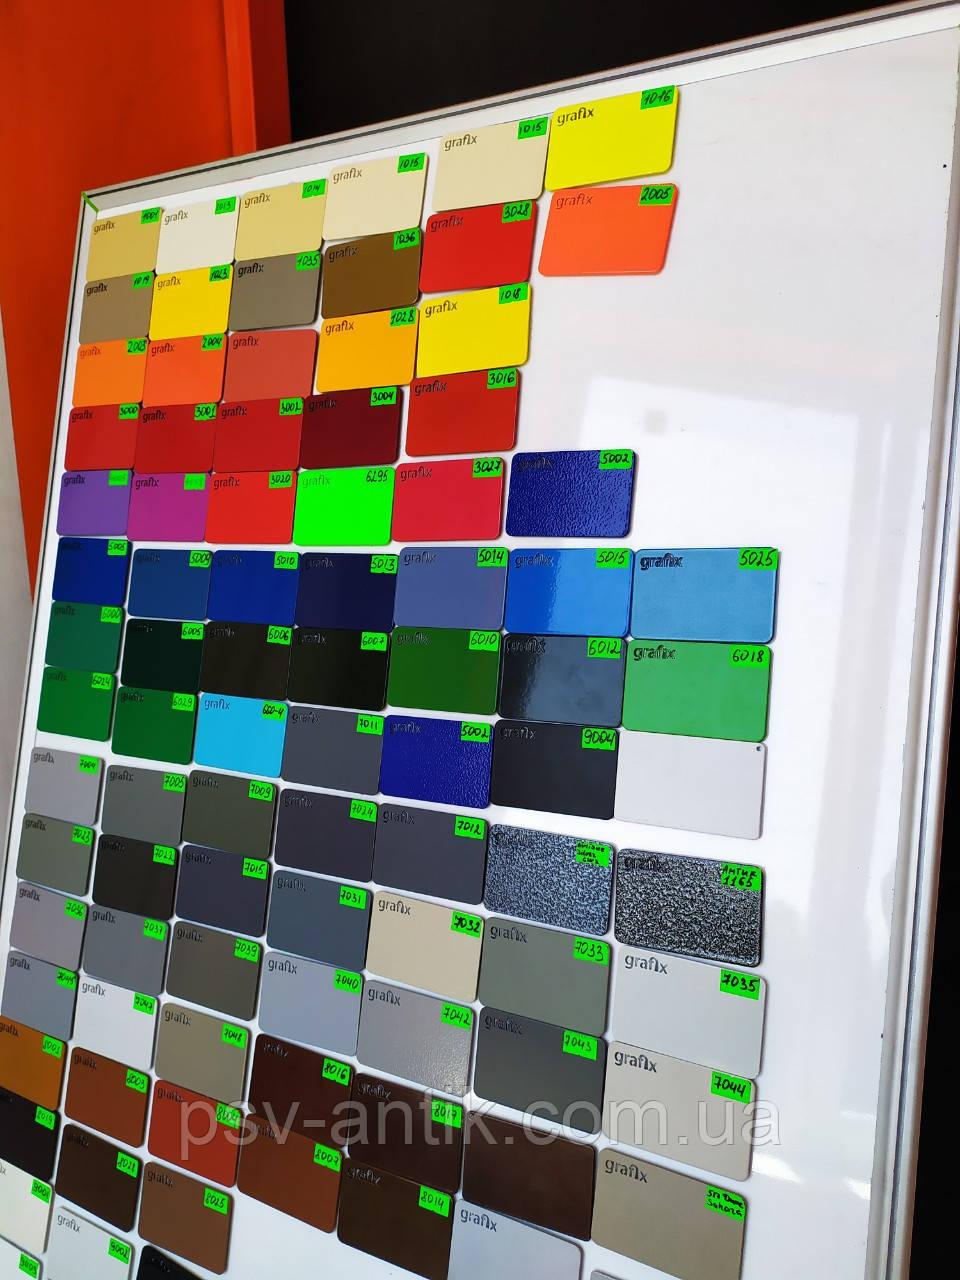 Порошковая краска глянцевая, полиэфирная, архитектурная, 6014